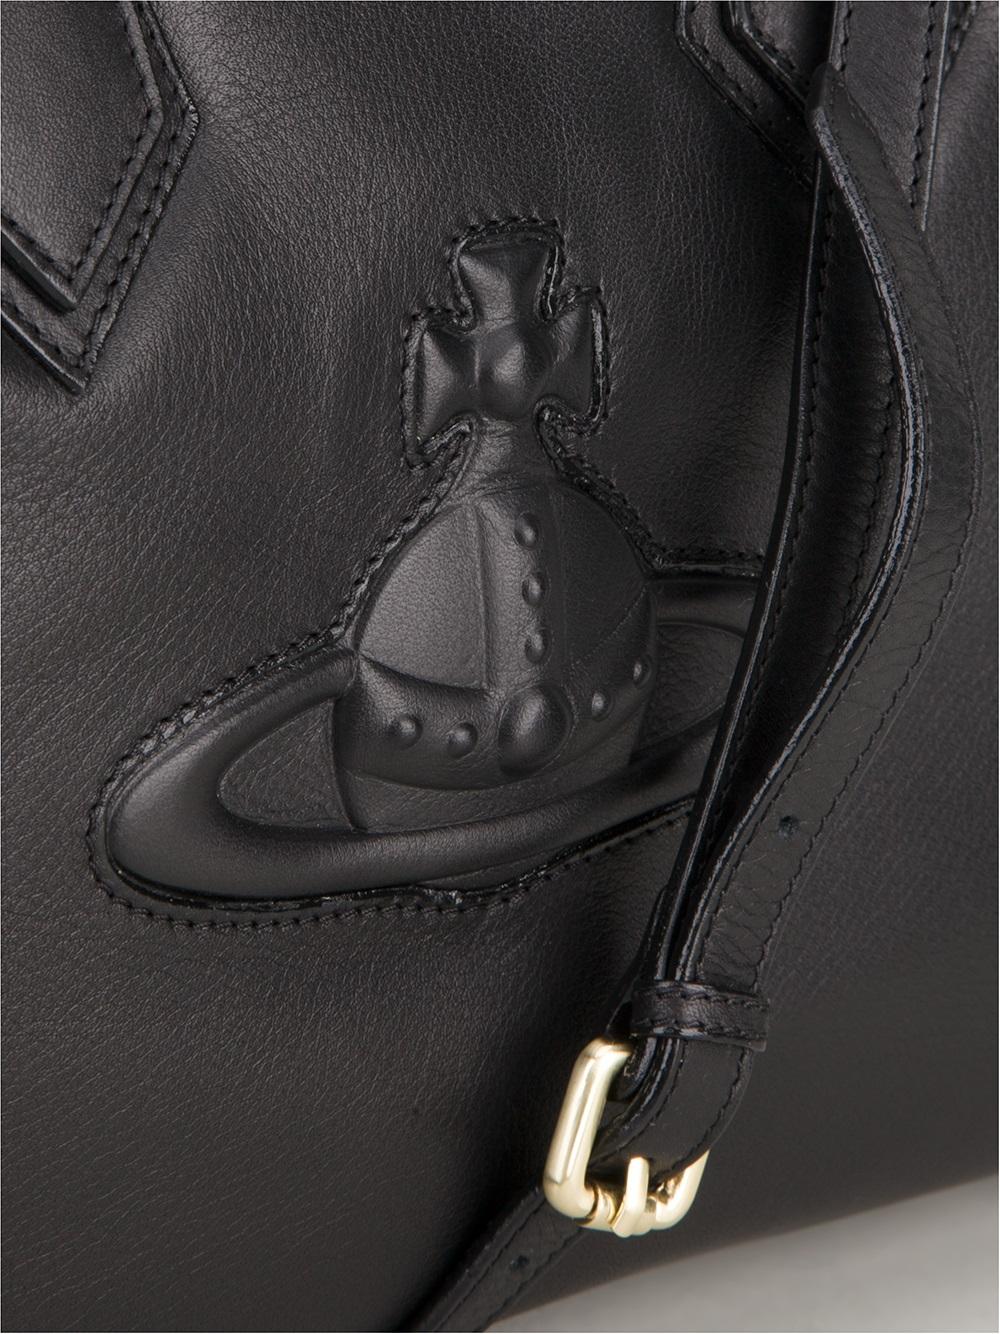 db3fd5fb61a Vivienne Westwood Chelsea Day Bag in Black - Lyst